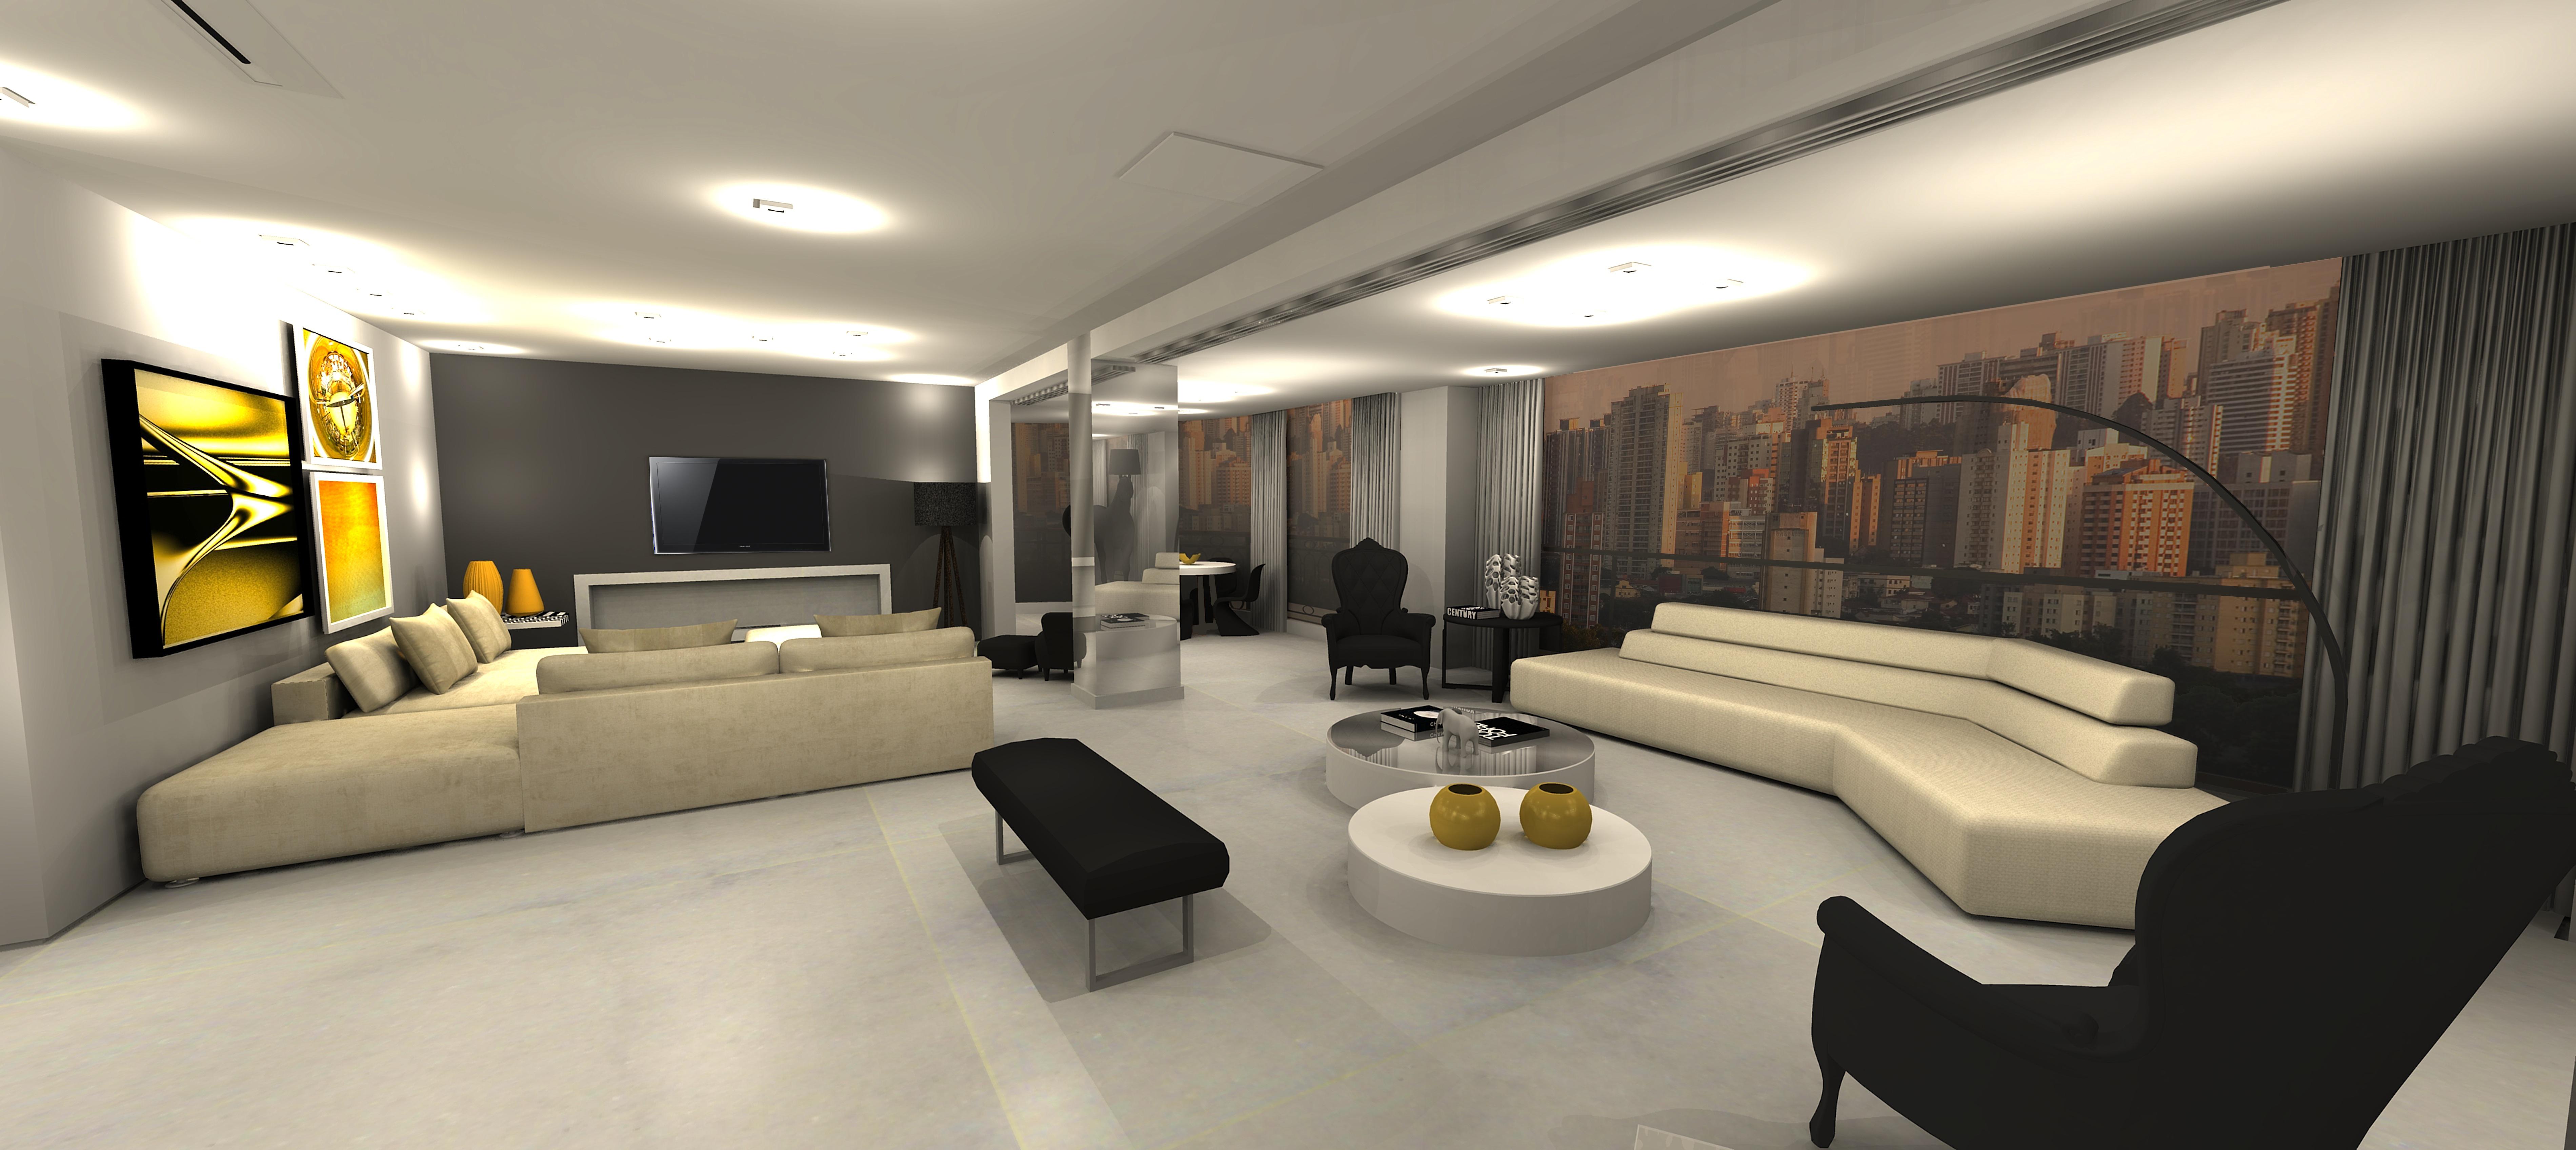 Revista Casa Projeto & Estilo: Luxo & Acessibilidade Helena Degreas #BC9D0F 7600 3392